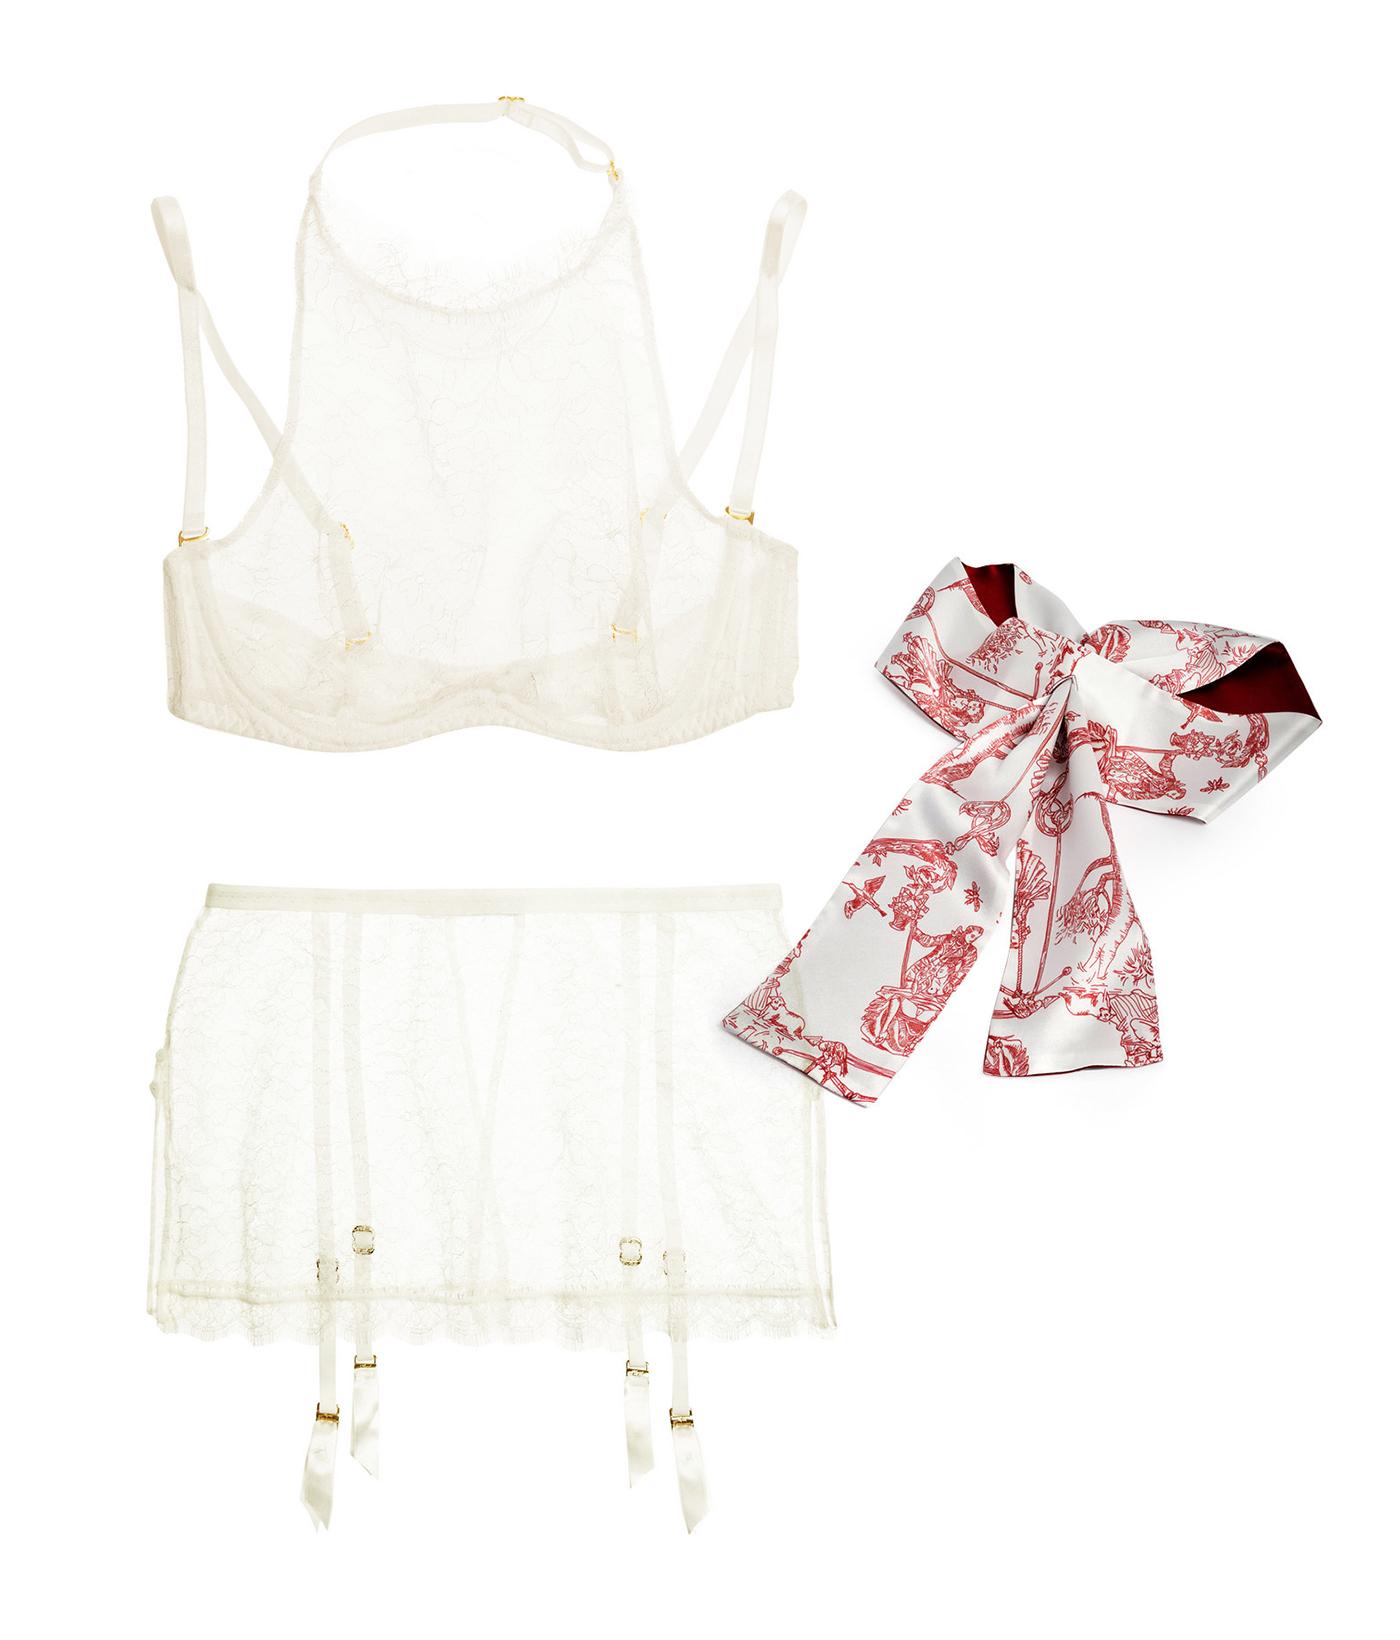 spring-wedding-dresses-accessories-28.jpg